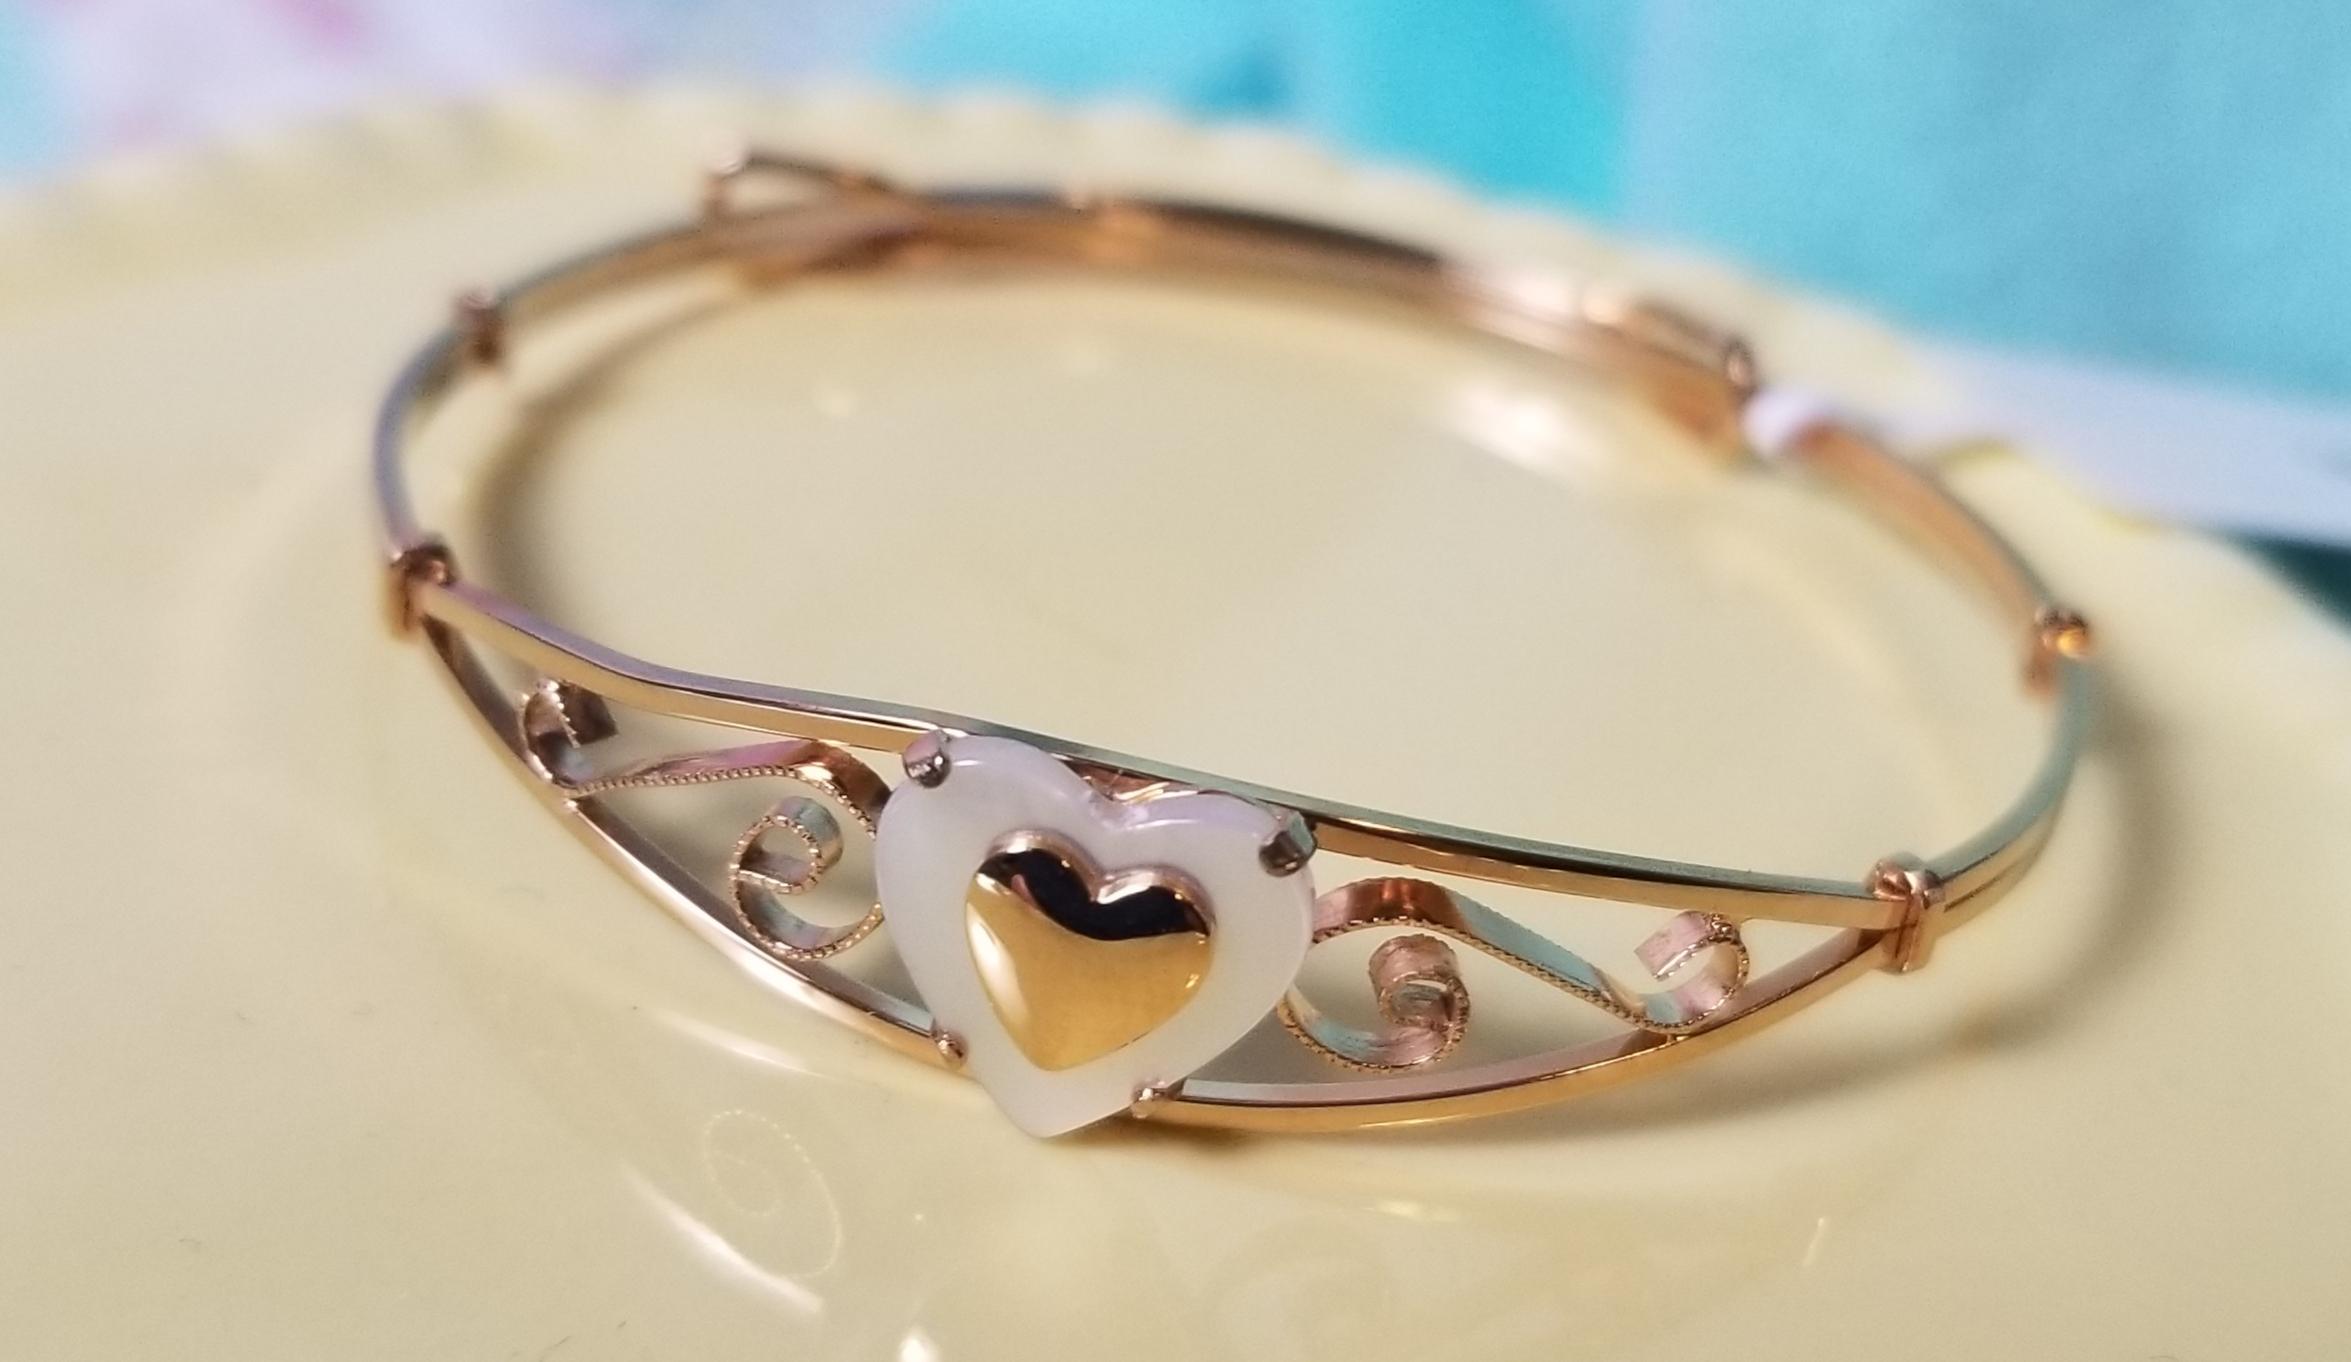 Gold Filled Heart on Mother of Pearl Bangle Bracelet - Mt0005B